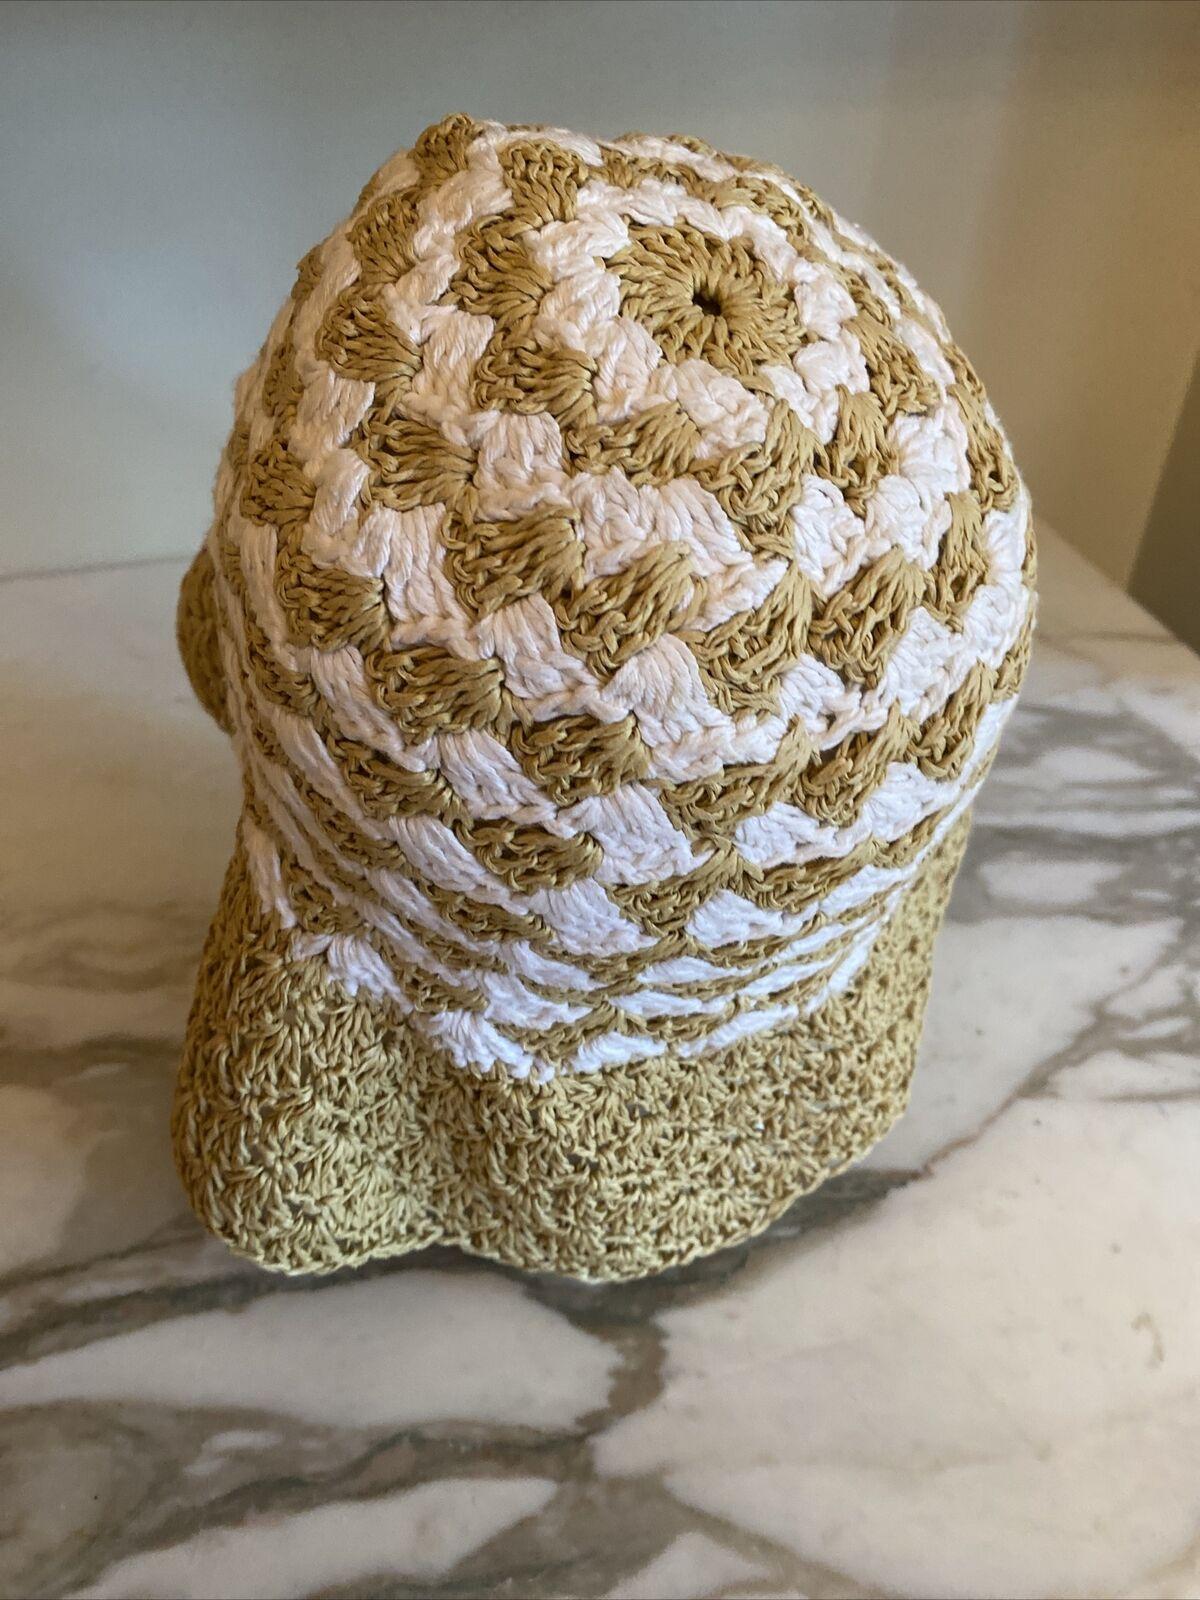 daniele meucci hat Paper Natural White Sun Hat - image 3